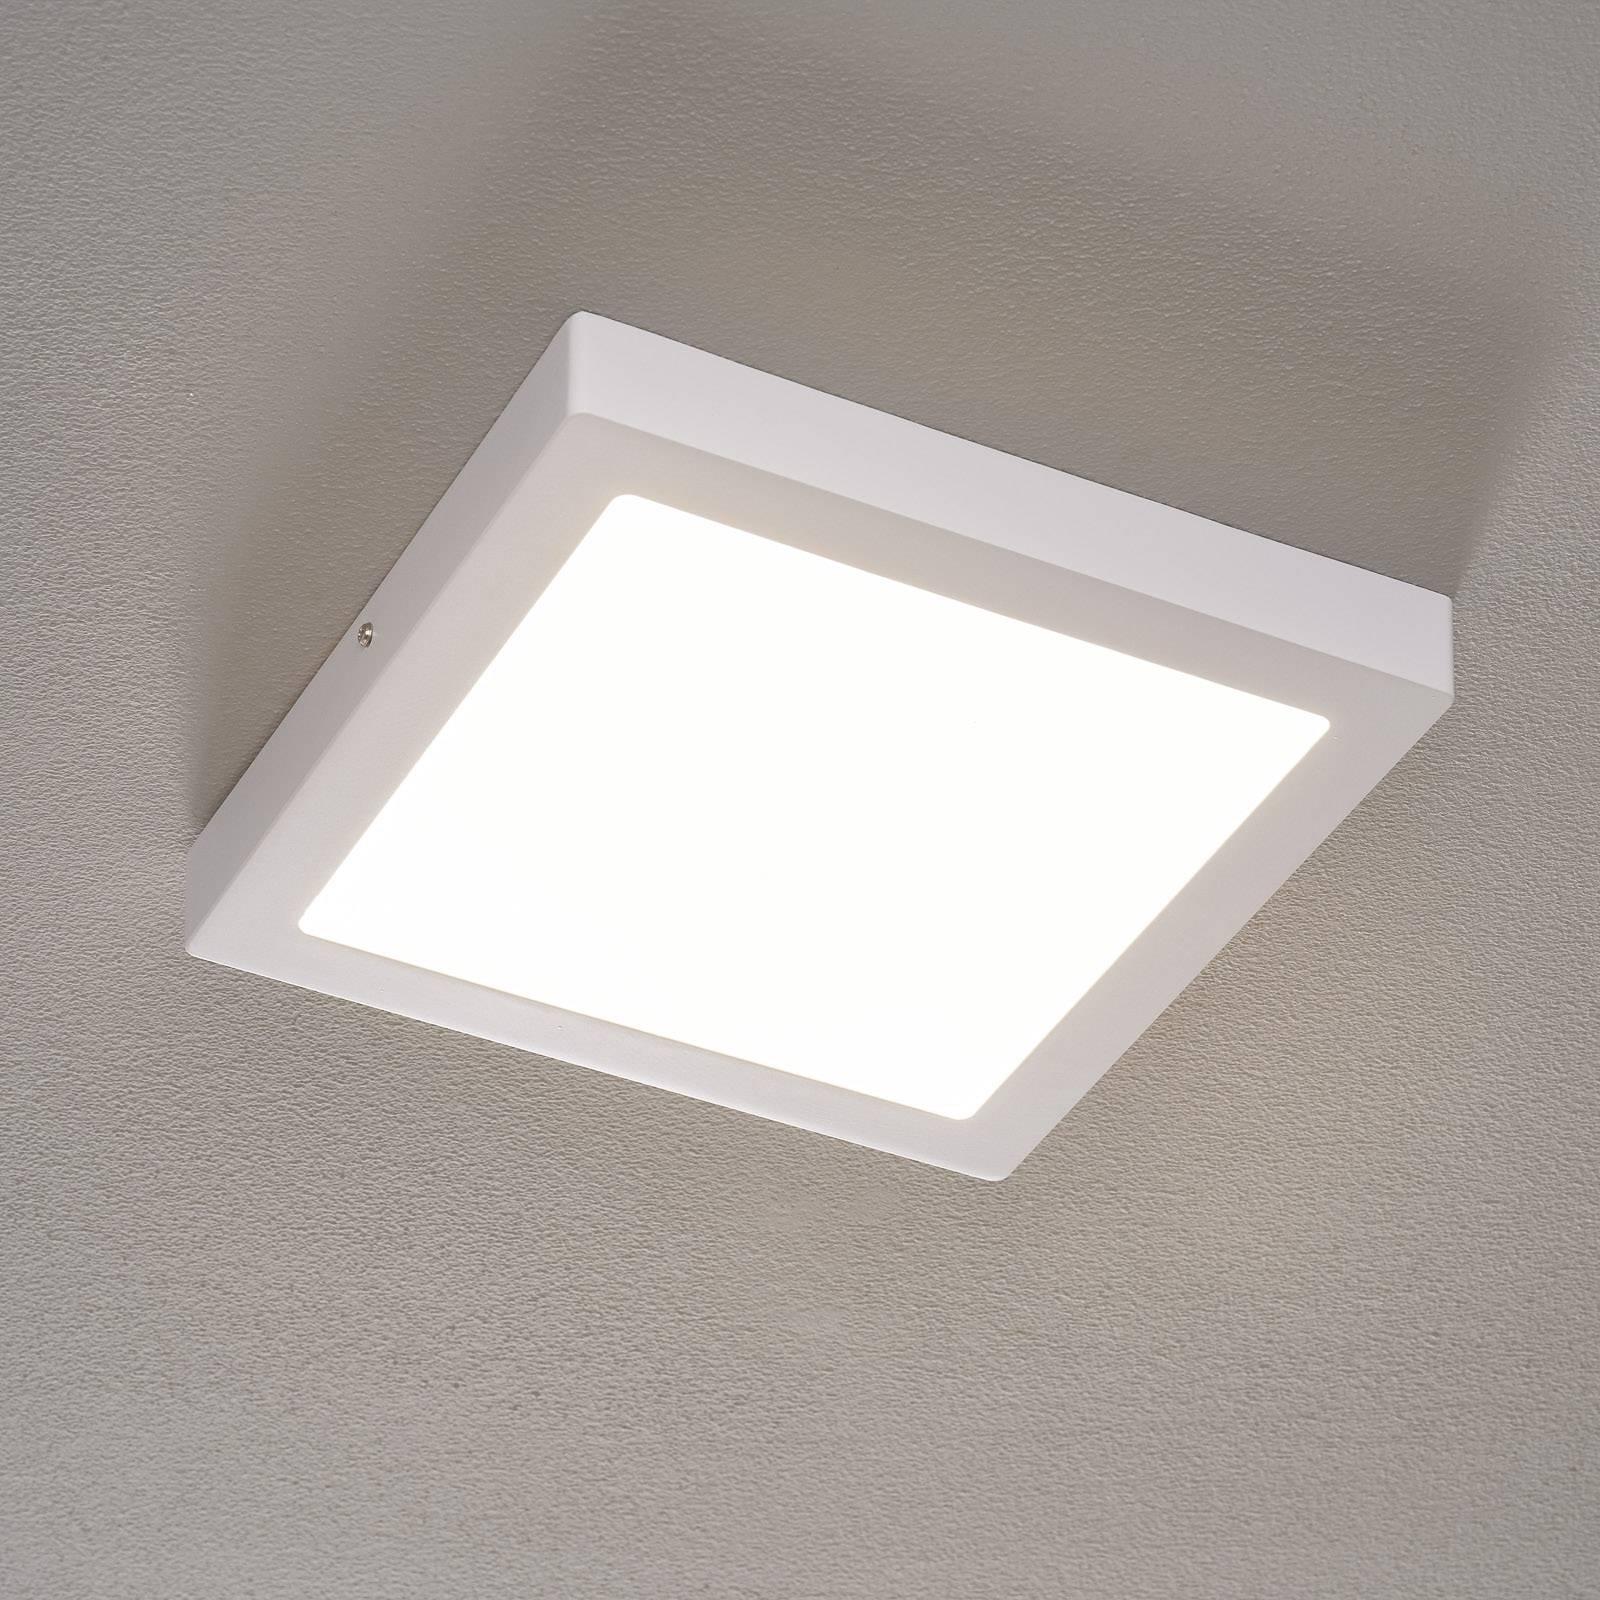 EGLO connect Fueva-C LED plafondlamp 30cm wit